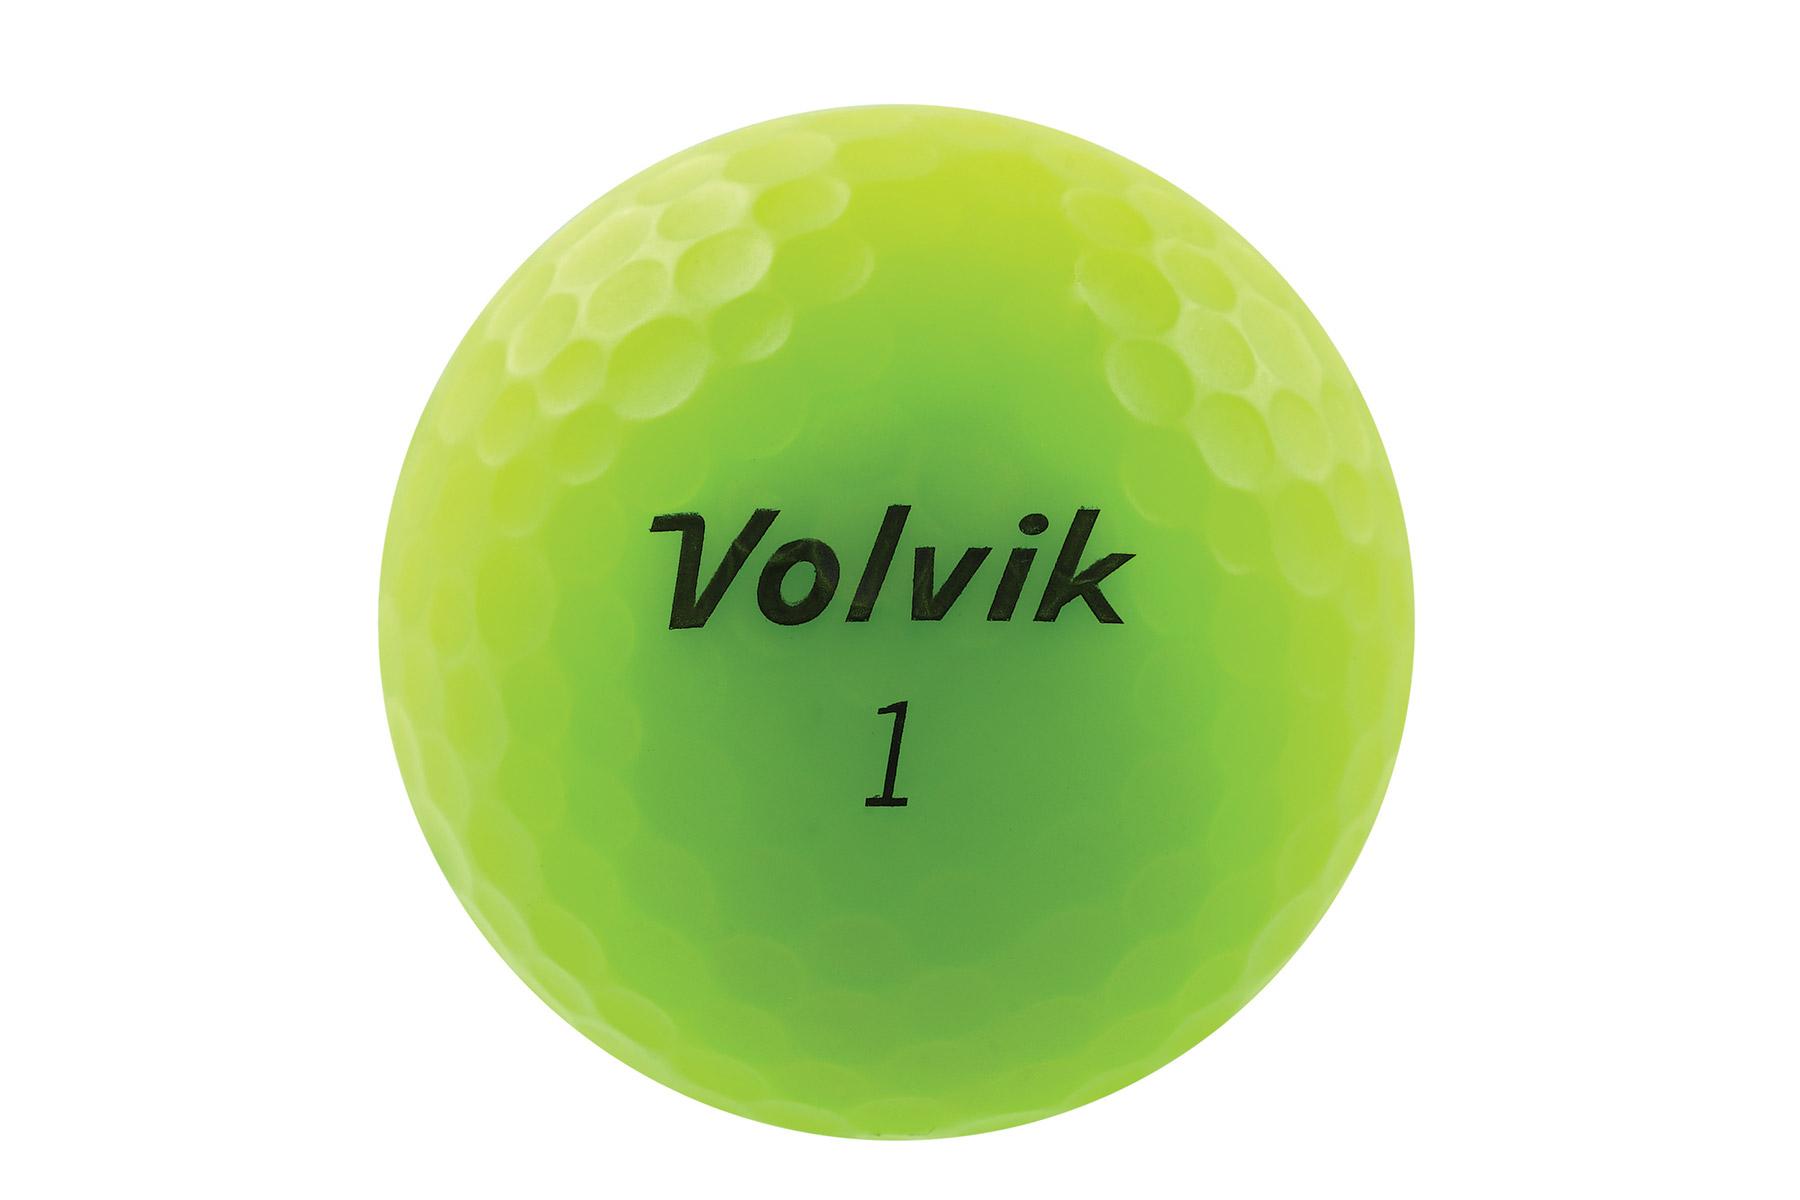 Volvik vivid ball pack from american golf